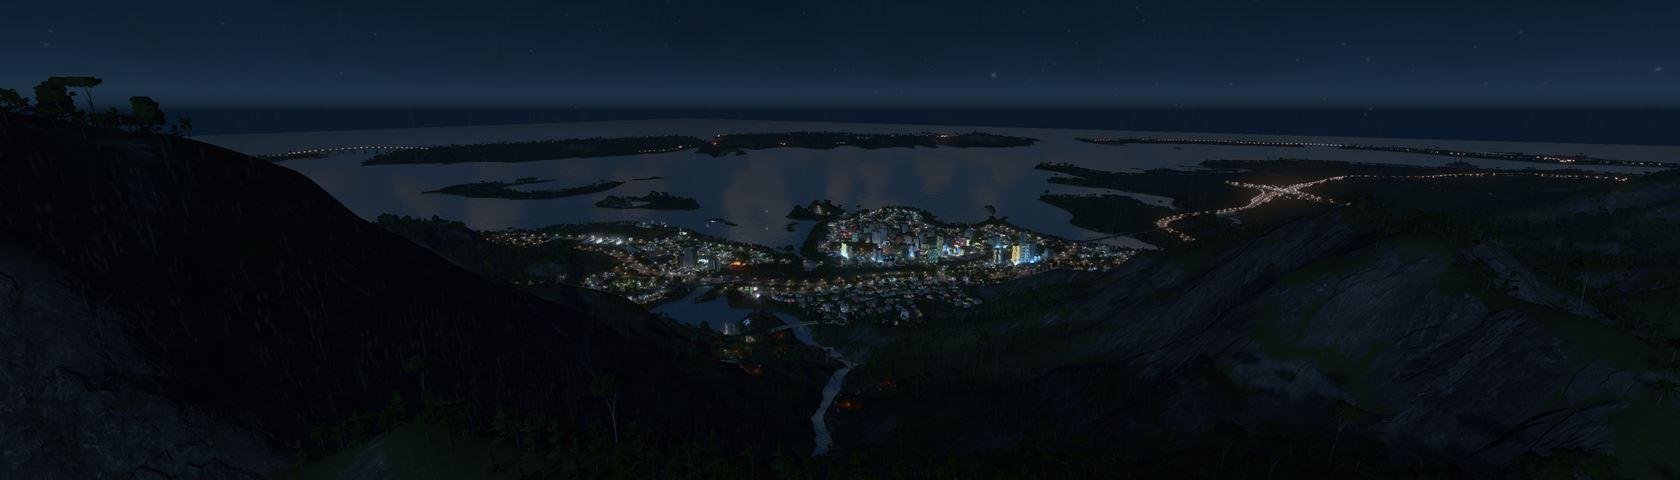 City Skylines by Night